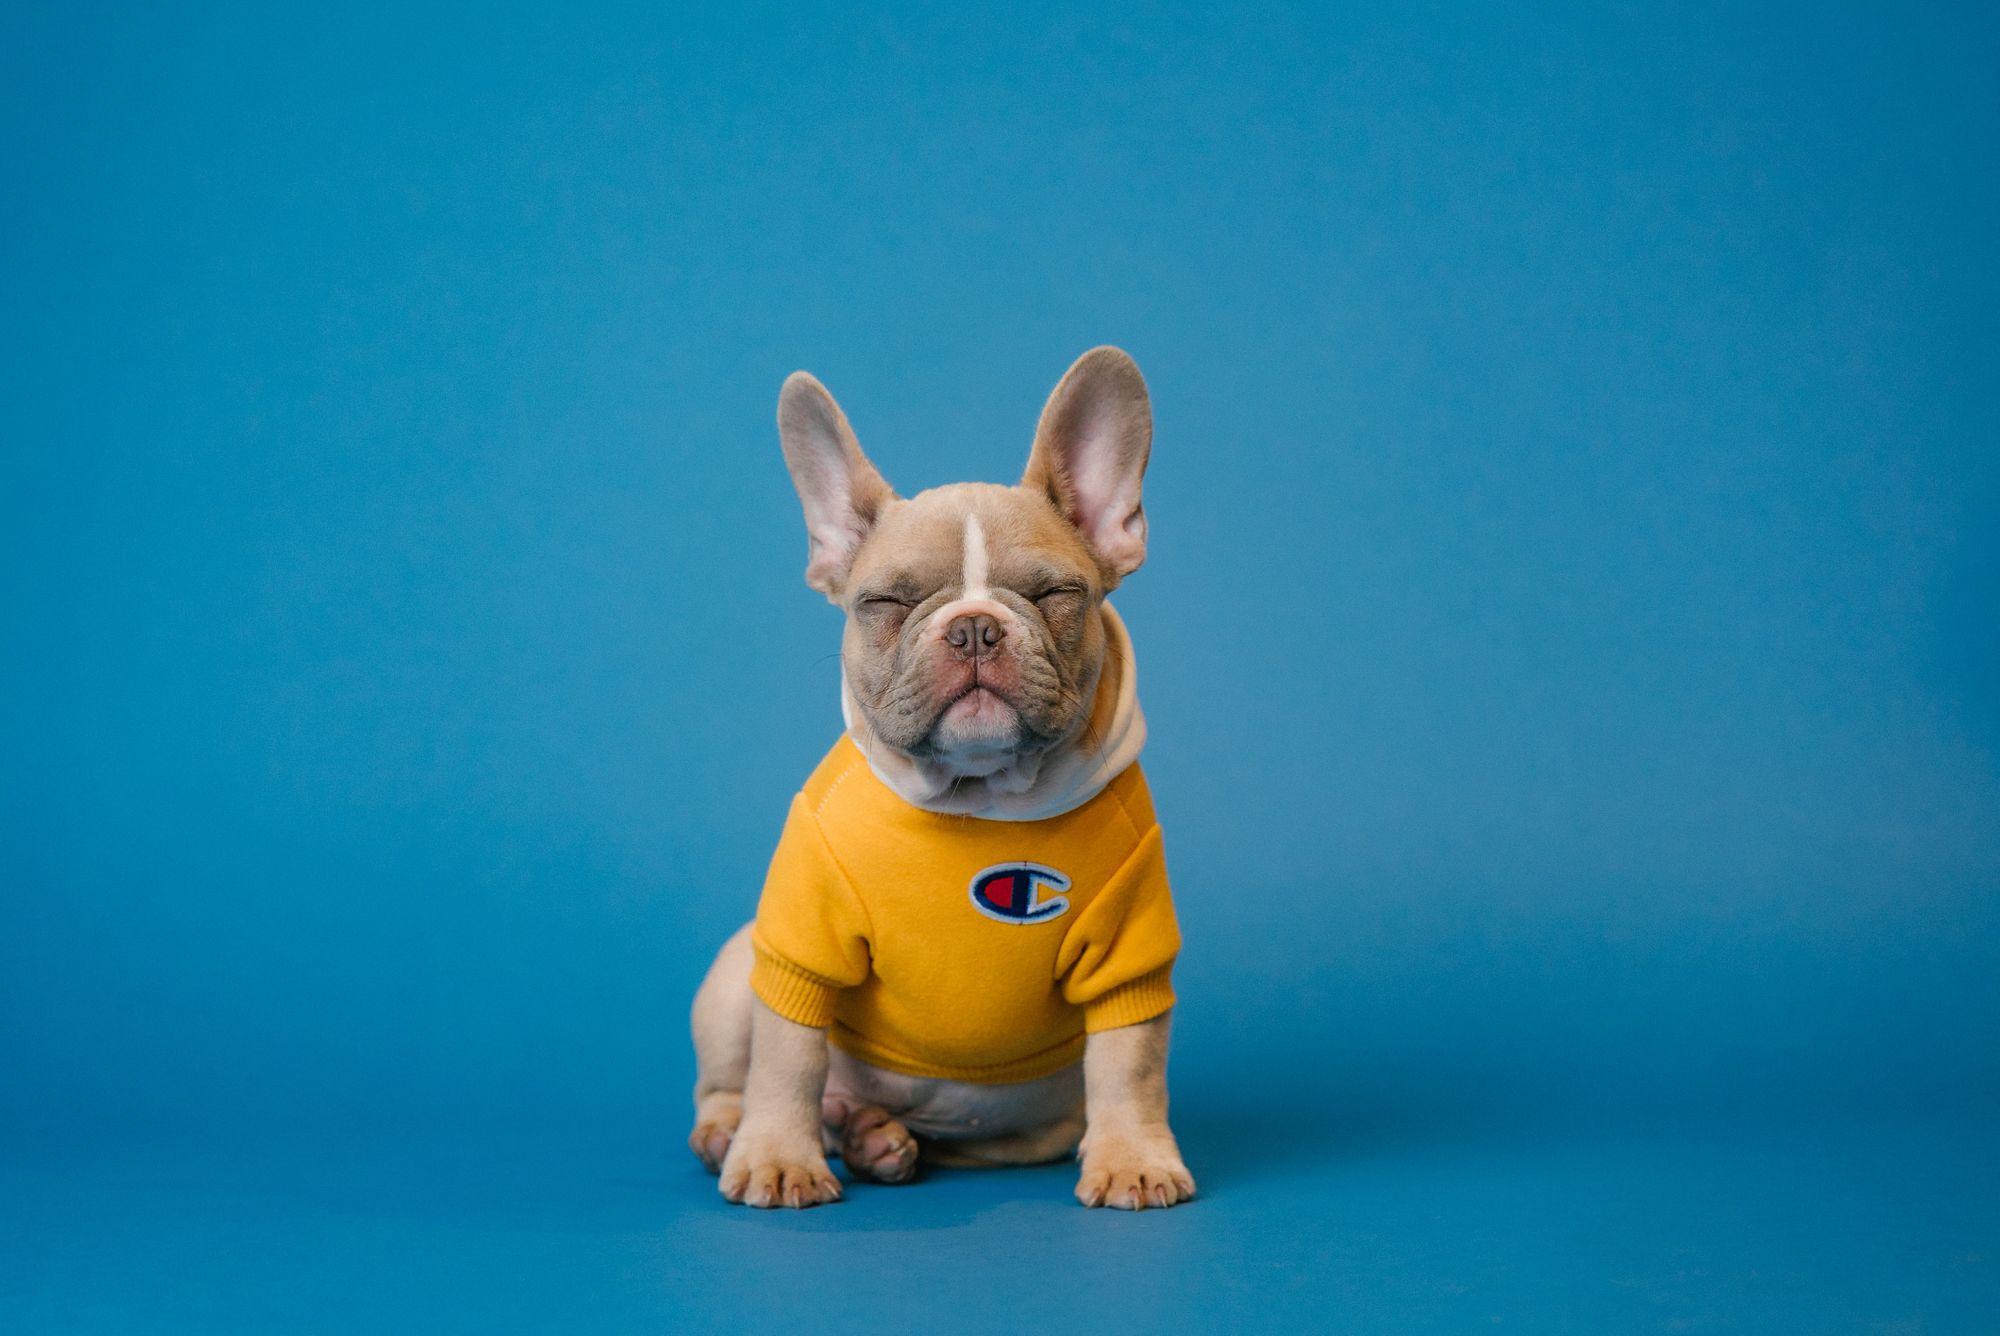 french bulldog - unsplash source